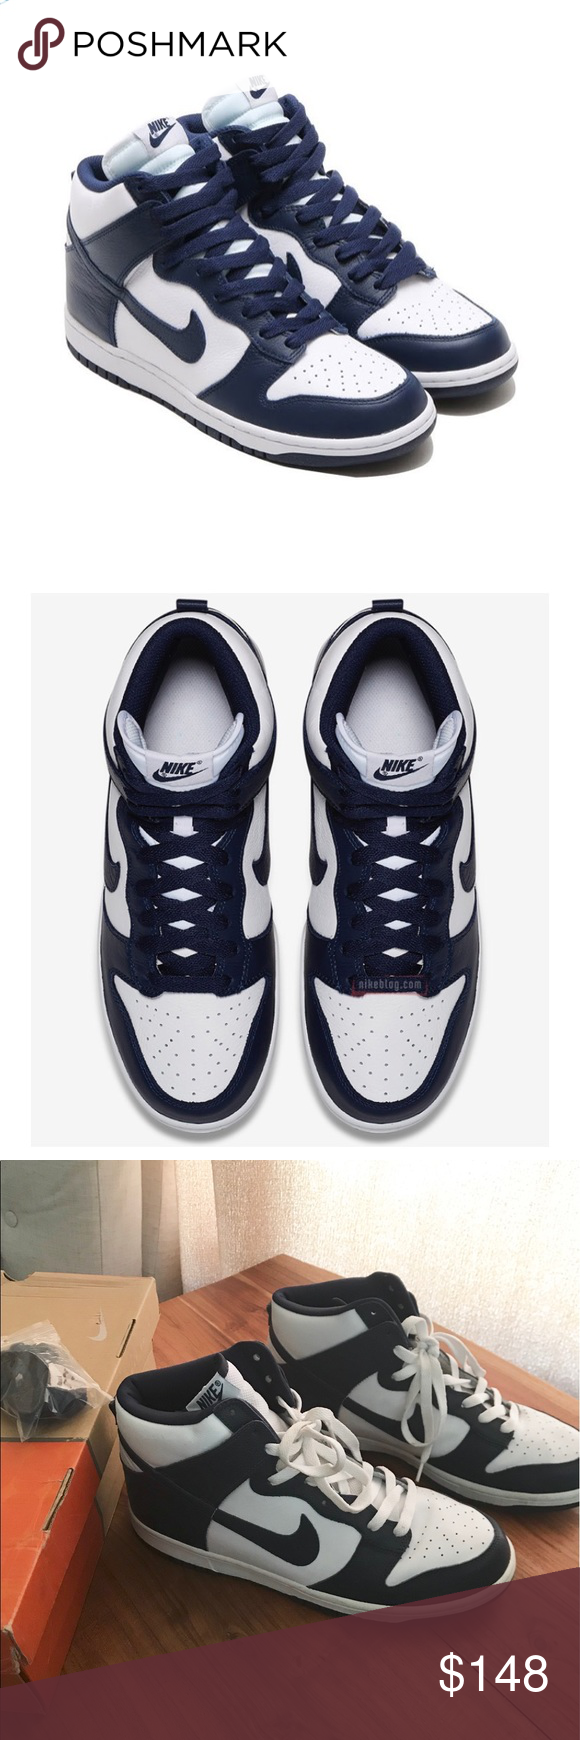 Nike Dunk Retro High Nike Dunks Nike Retro